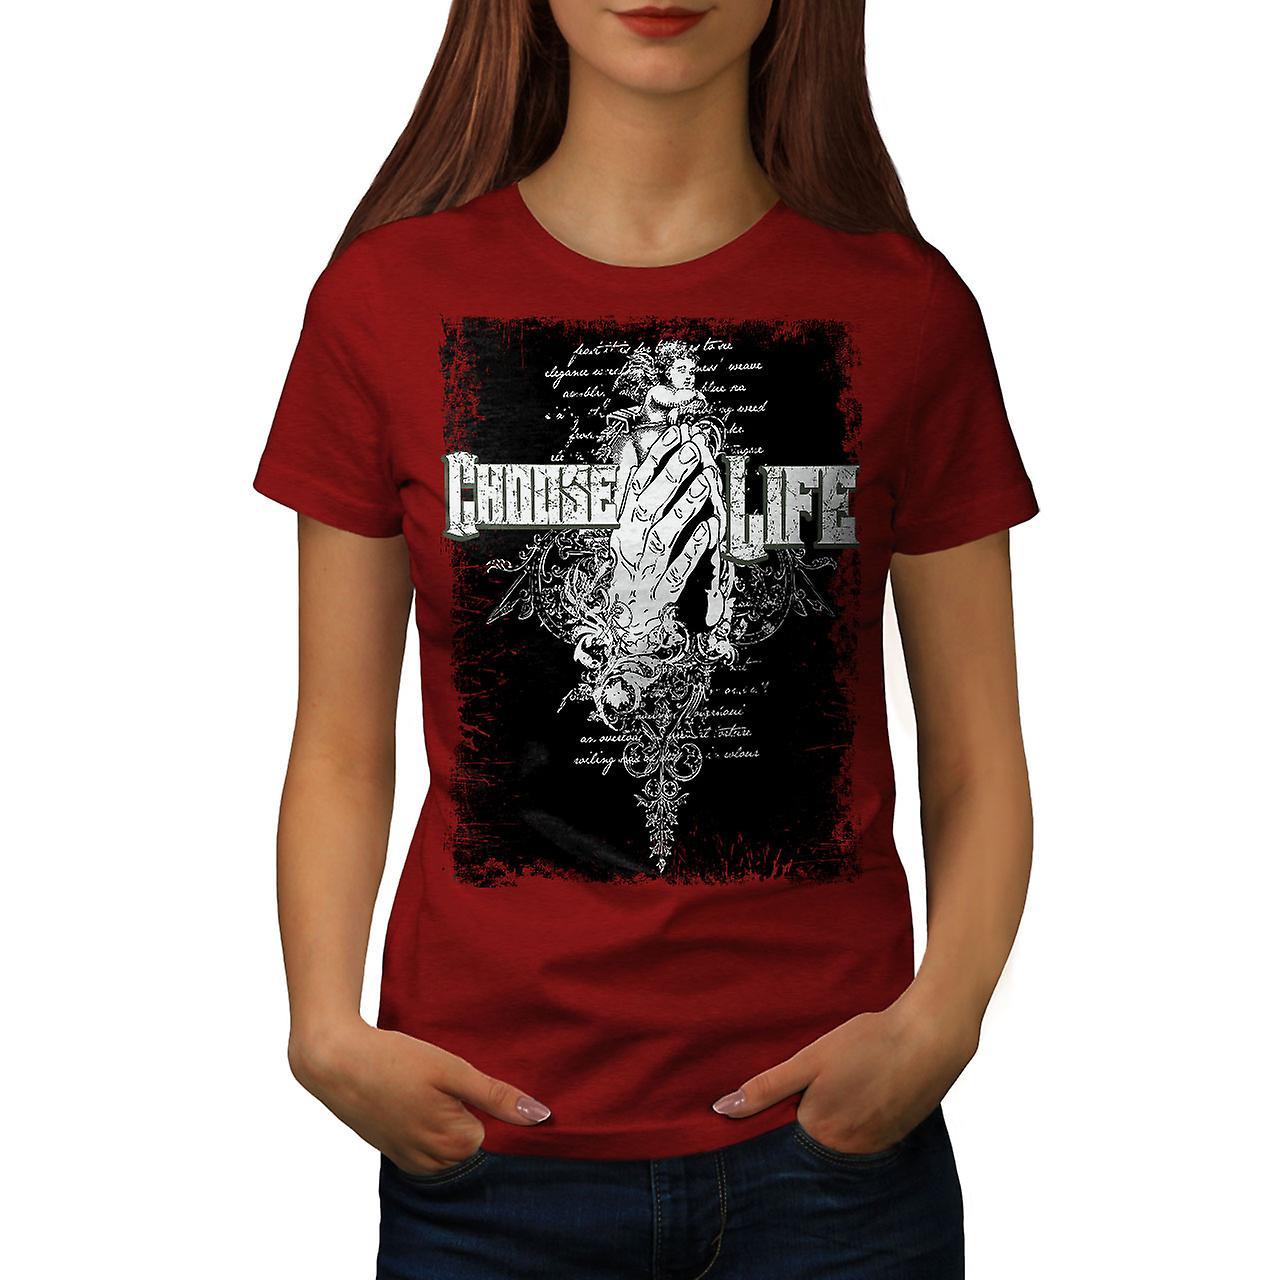 Choisir la vie femmes mortes RedT-chemise | Wellcoda